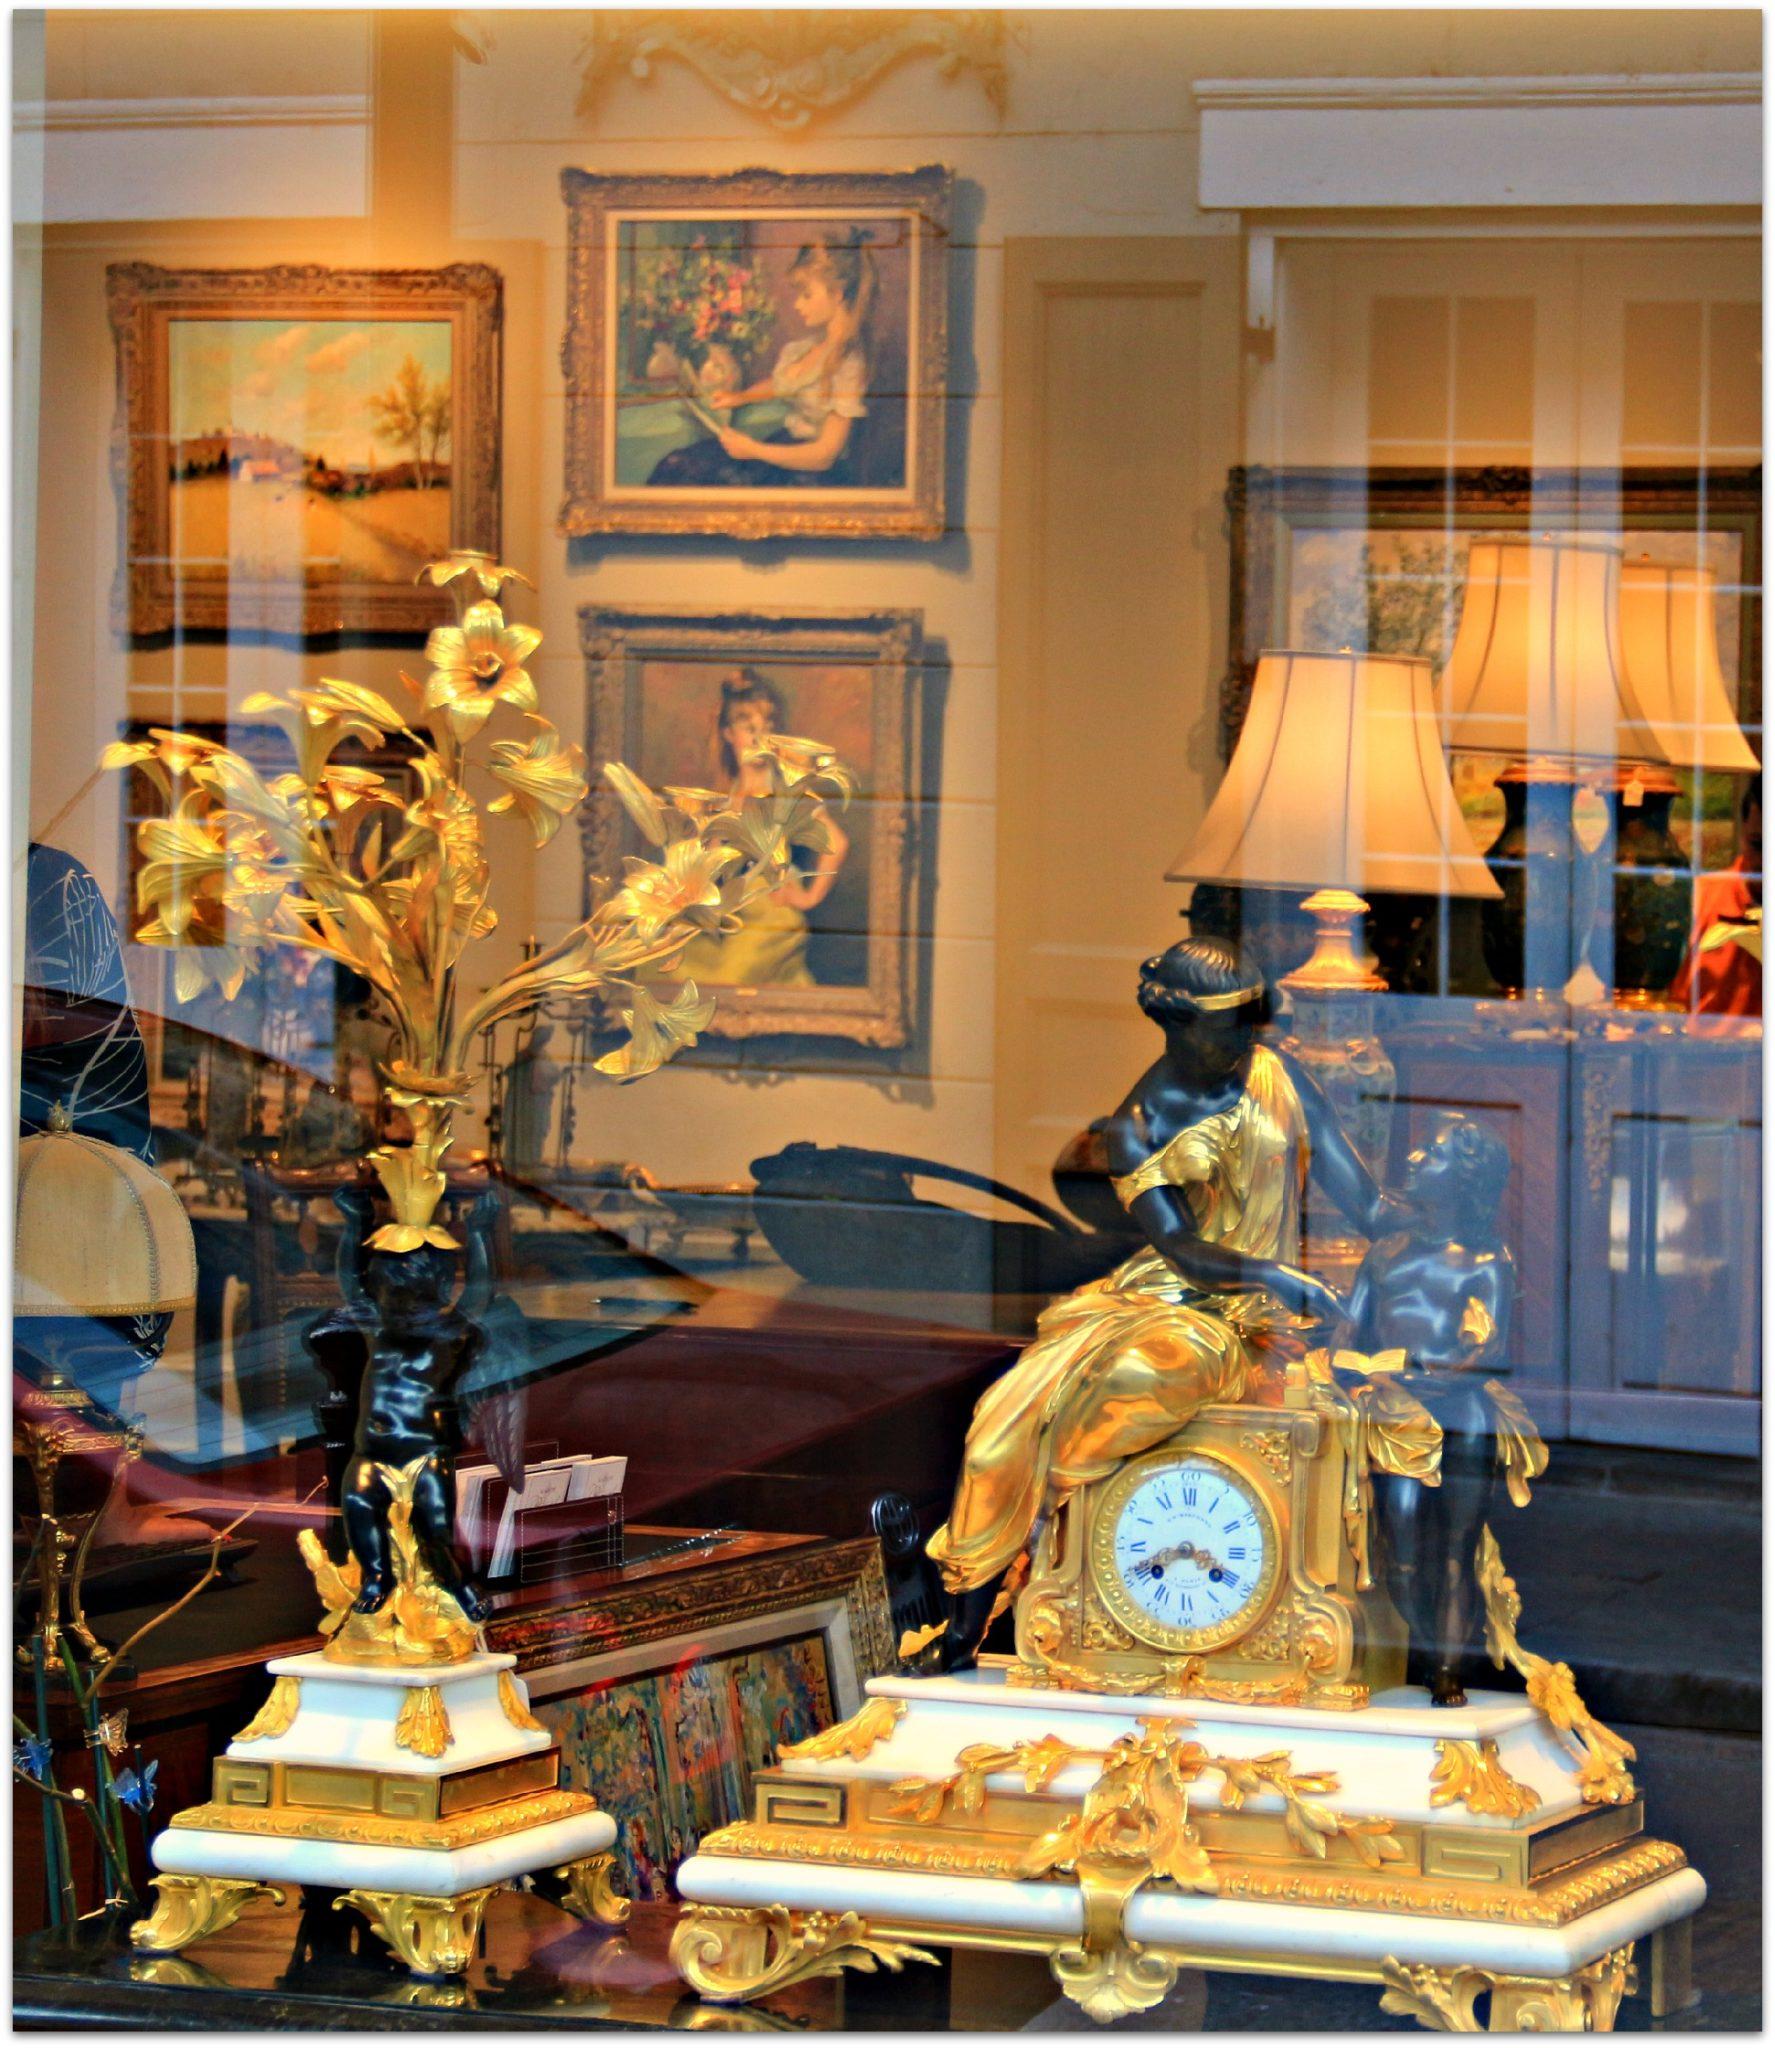 Antiques Shops on Royal Street